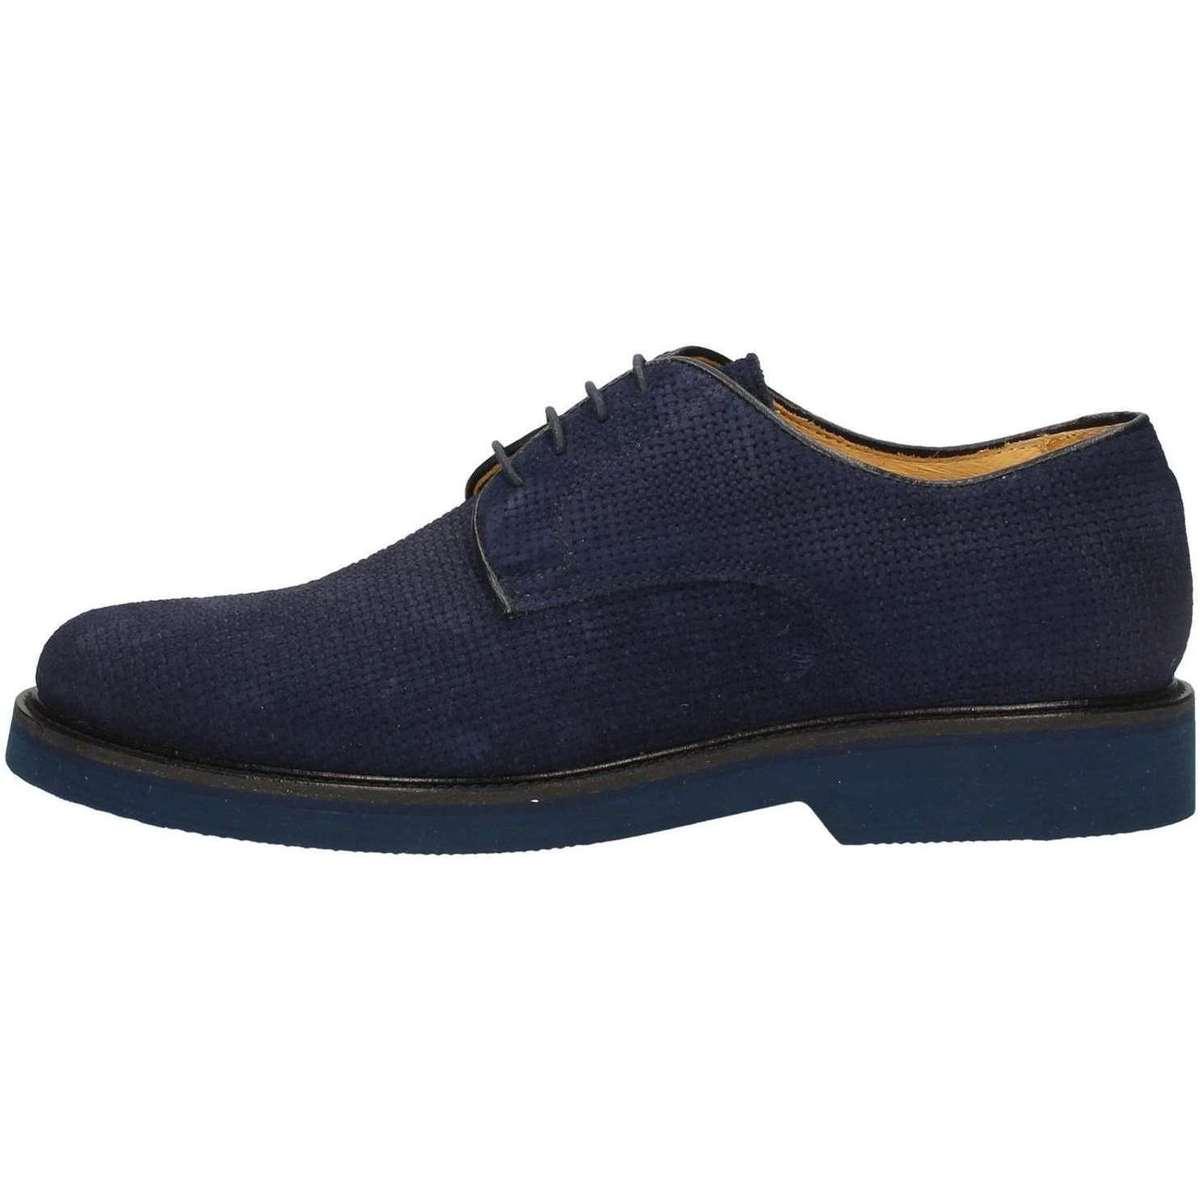 Hudson 901 Lace up shoes Mann Blau Blau - Schuhe Derby-Schuhe Herren 104,00 €